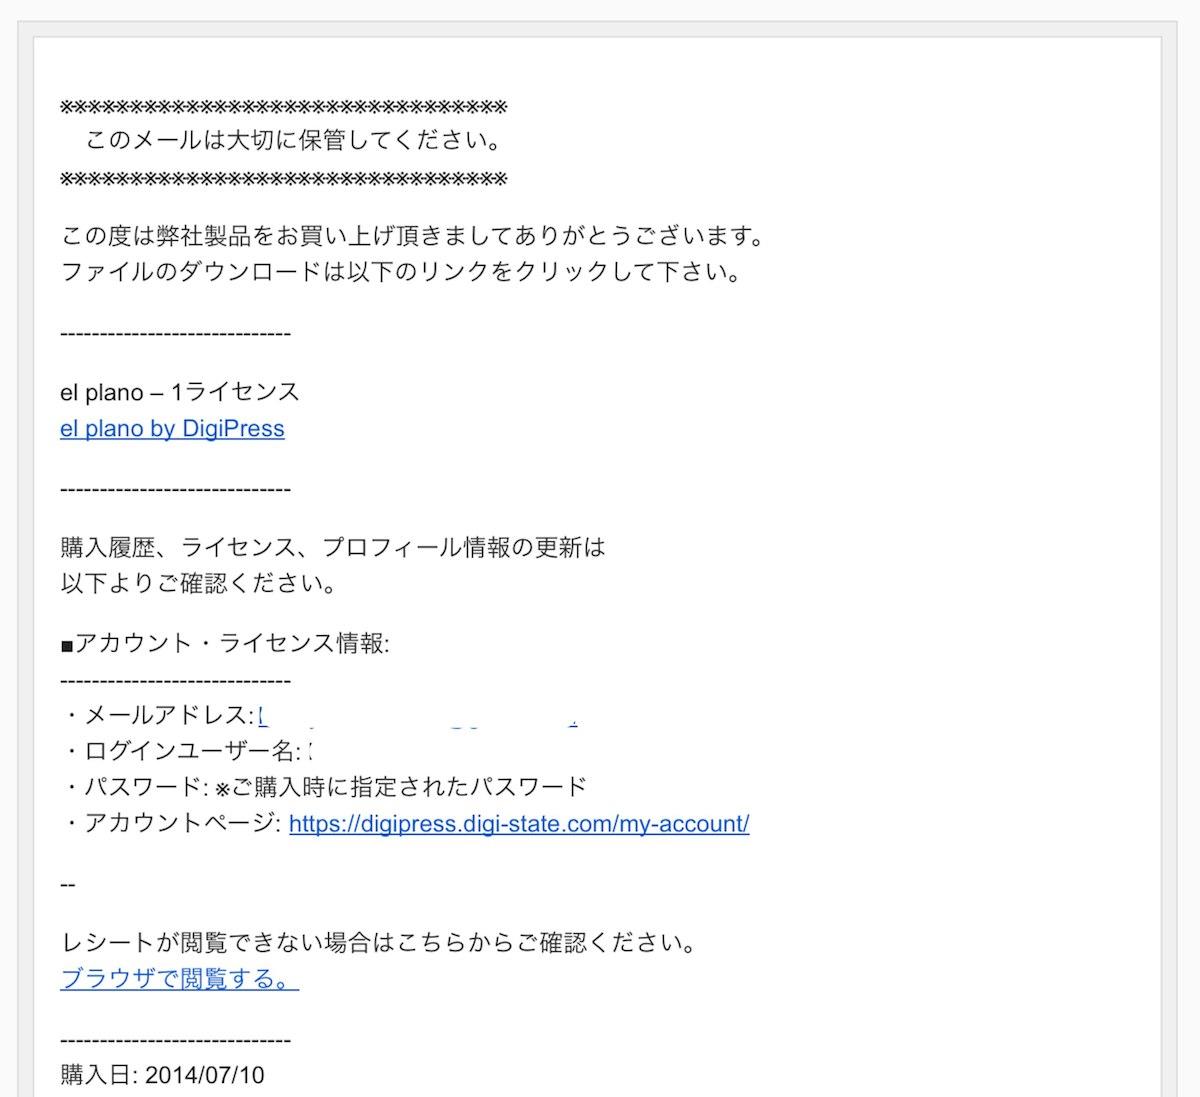 【DigiPress】商品情報・レシートのご連絡 - kazuyoshi.katano@gmail.com - Gmail